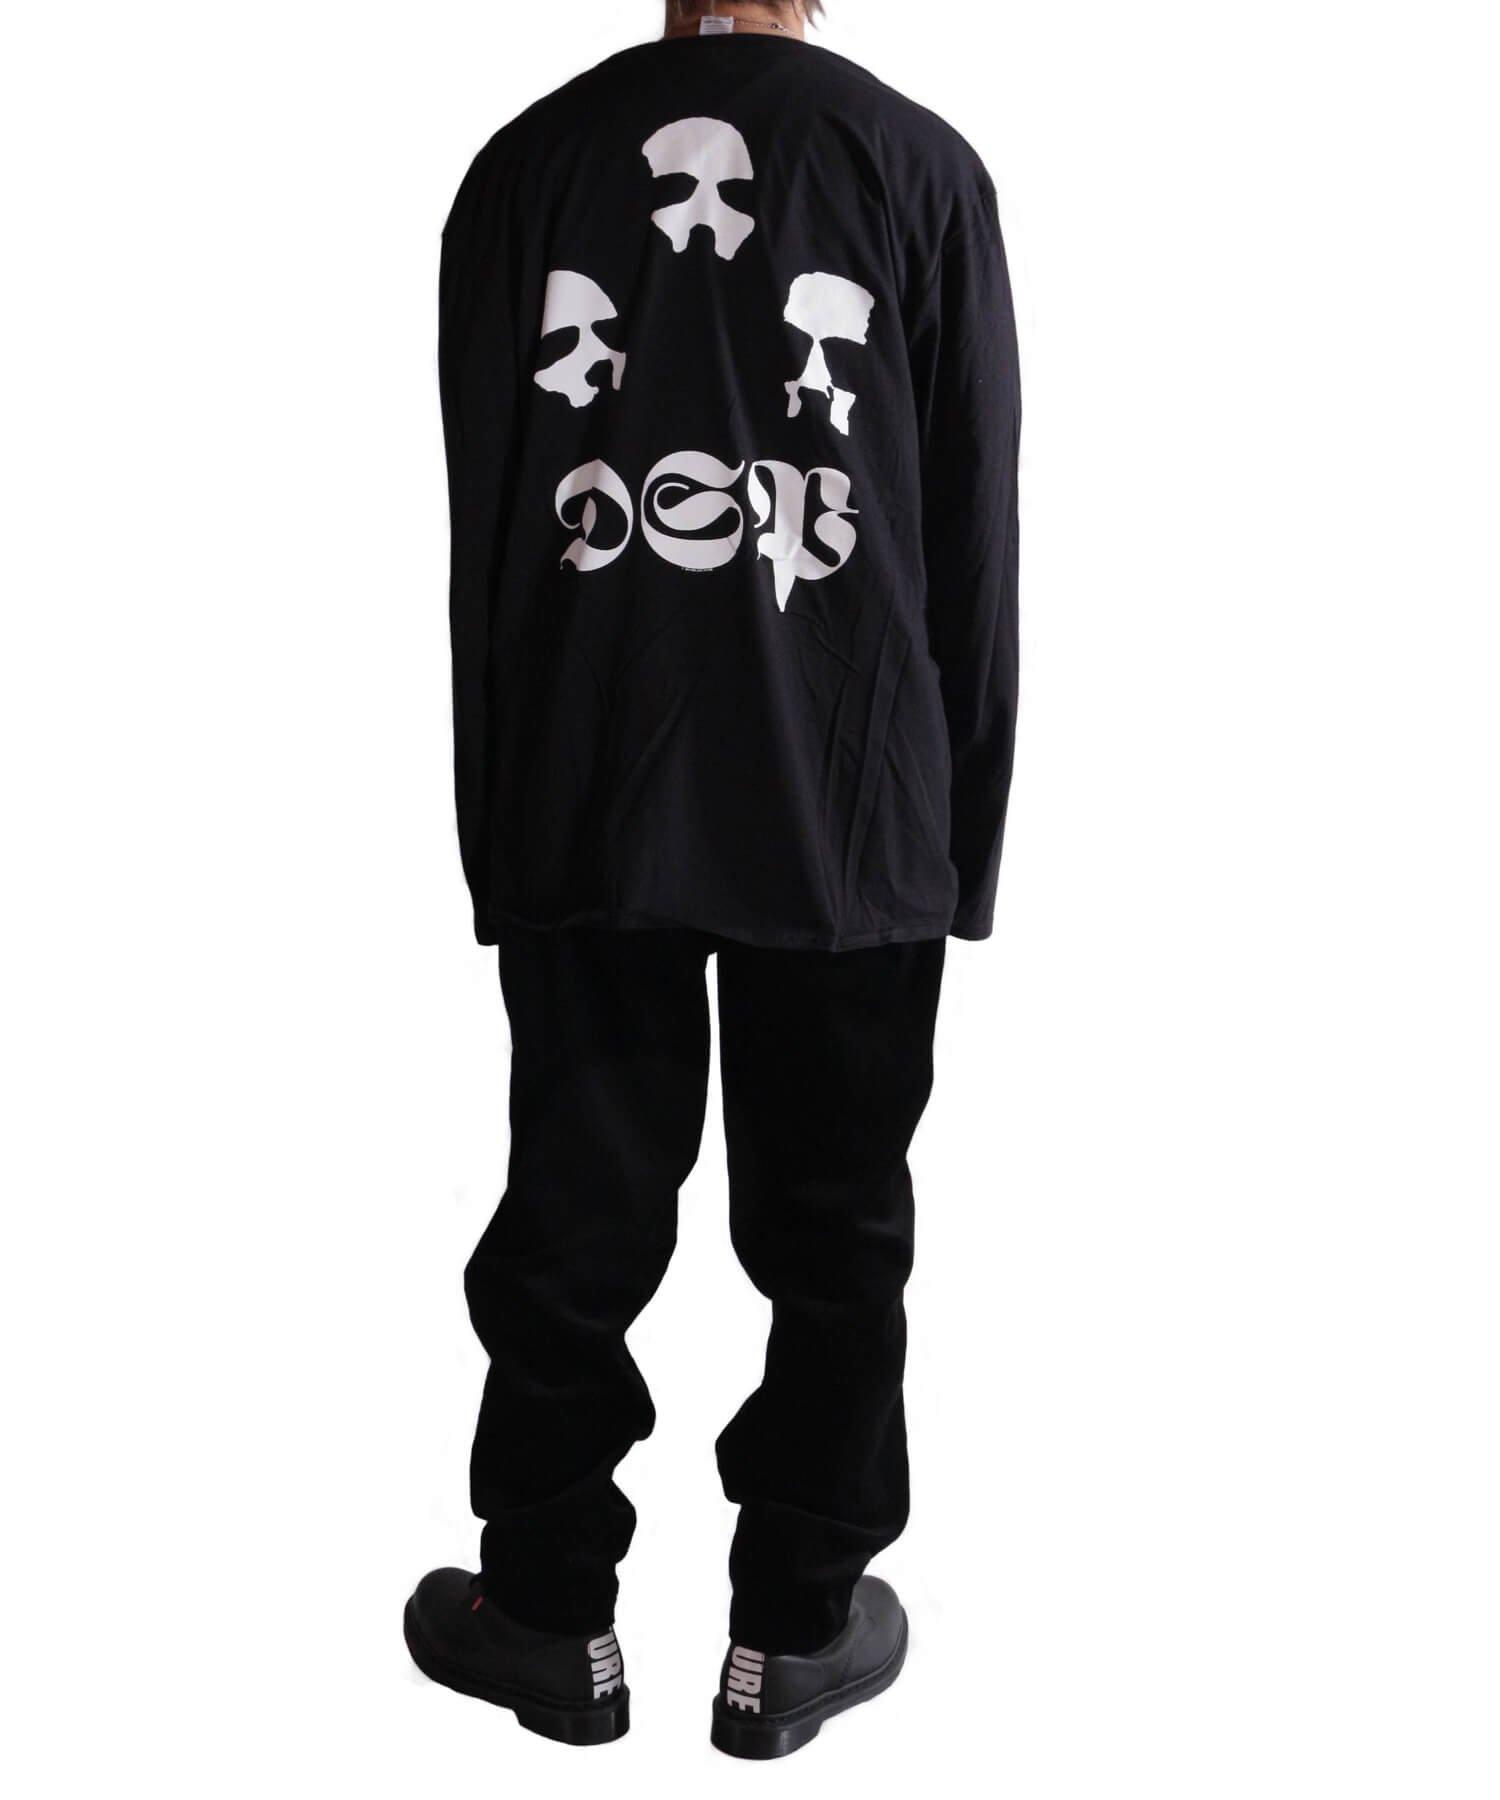 Official Artist Goods / バンドTなど |MAYHEM / メイヘム:DE MYSTERIIS DOM SATHANAS LONG SLEEVE SHIRT (BLACK) 商品画像12